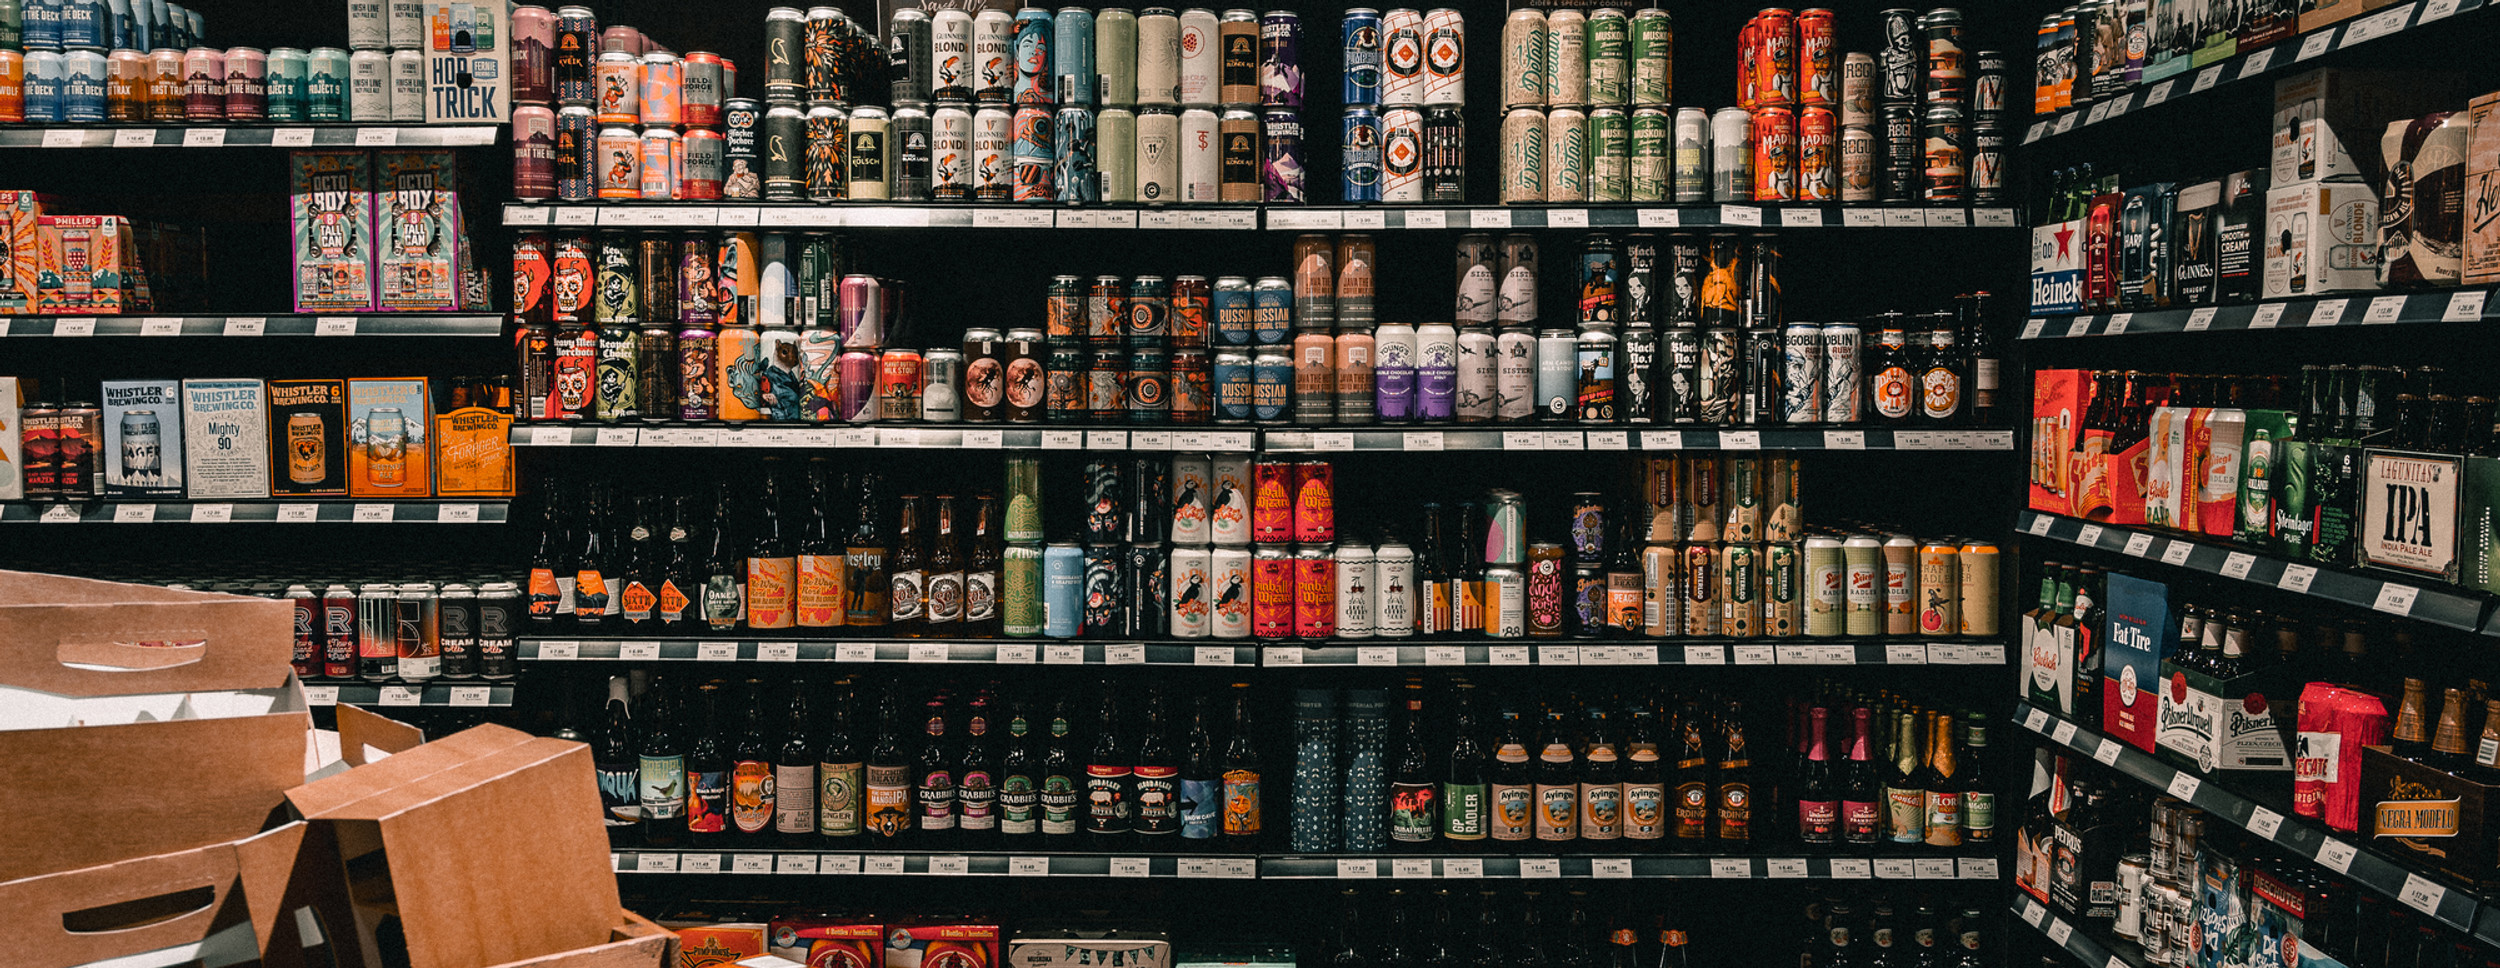 distilledliquor_websitephoto (22 of 27).